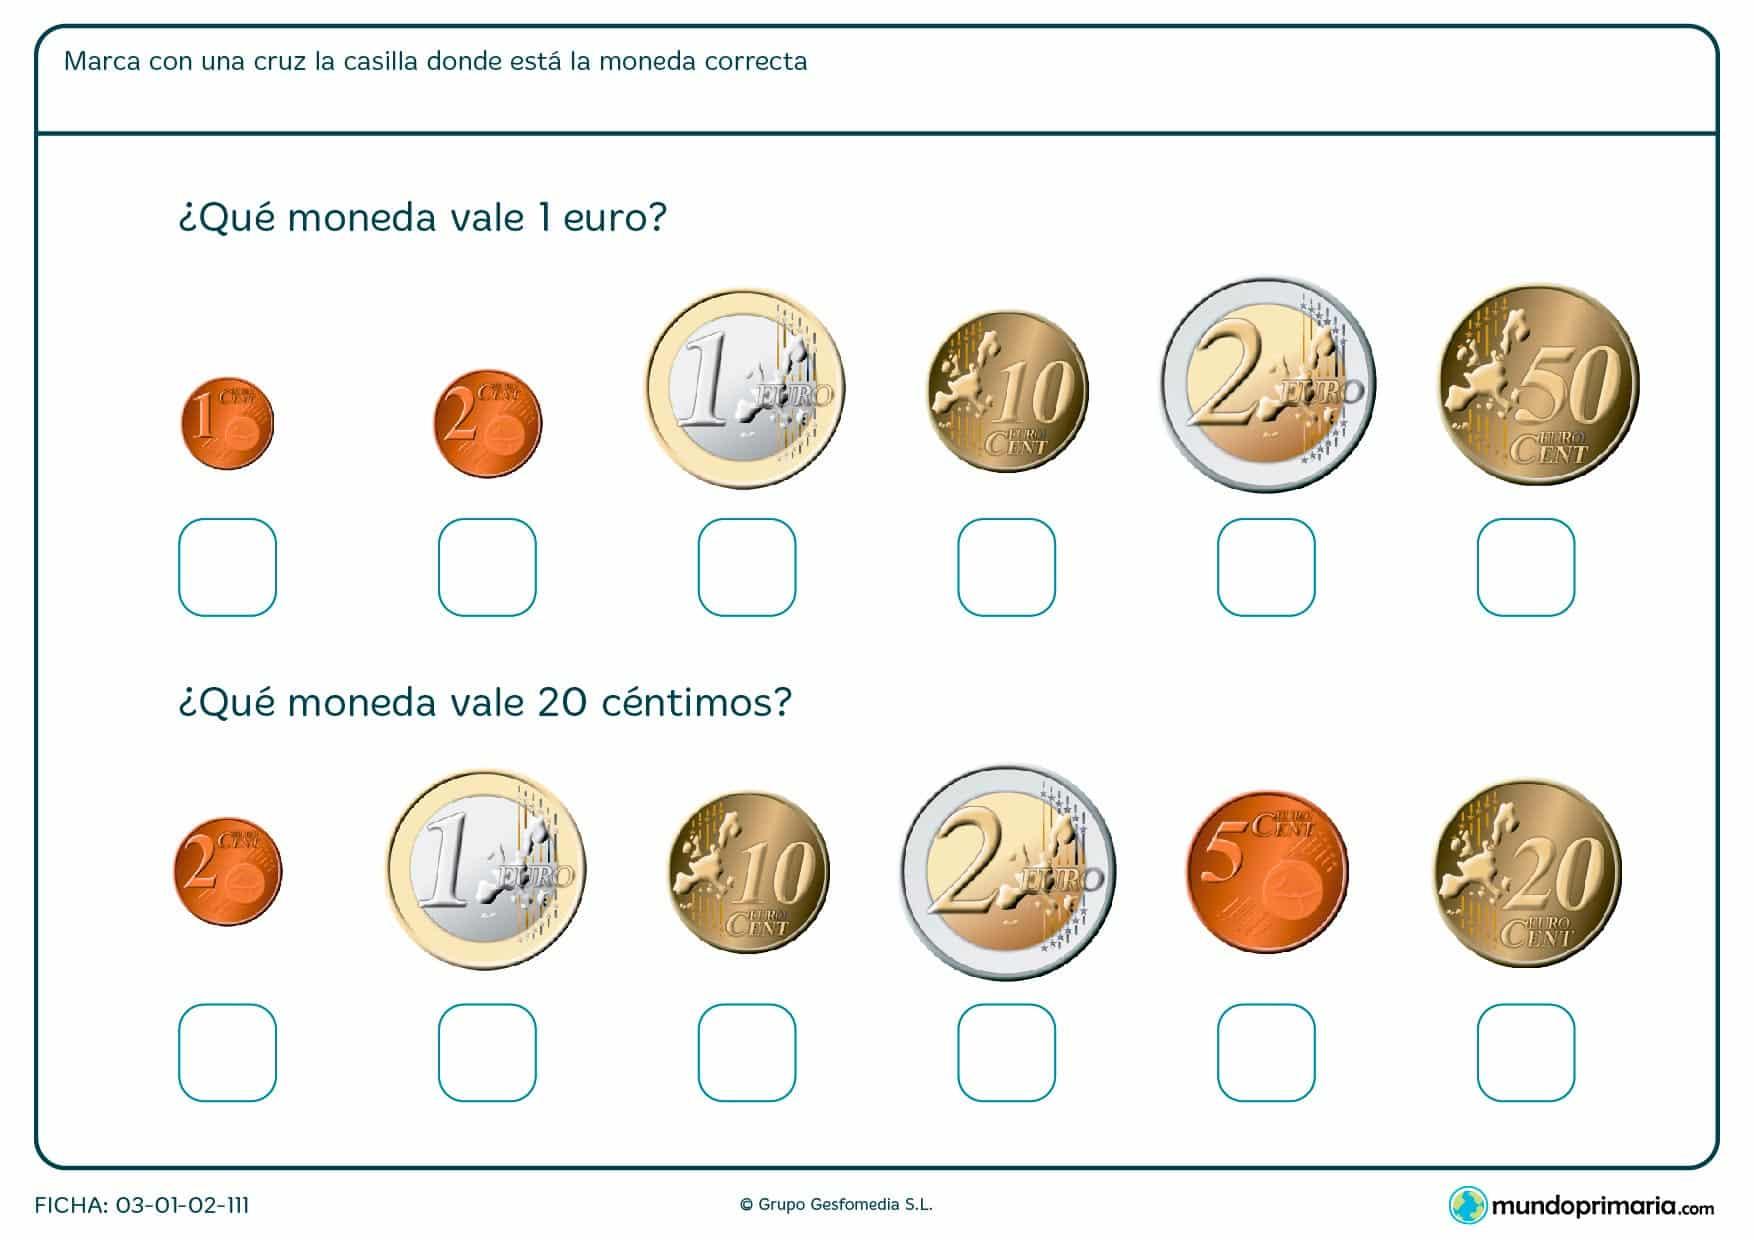 Ficha de monedas de 1 euro en la que deberás señalar cuál corresponde a 1 euro y cuál a 20 céntimos.